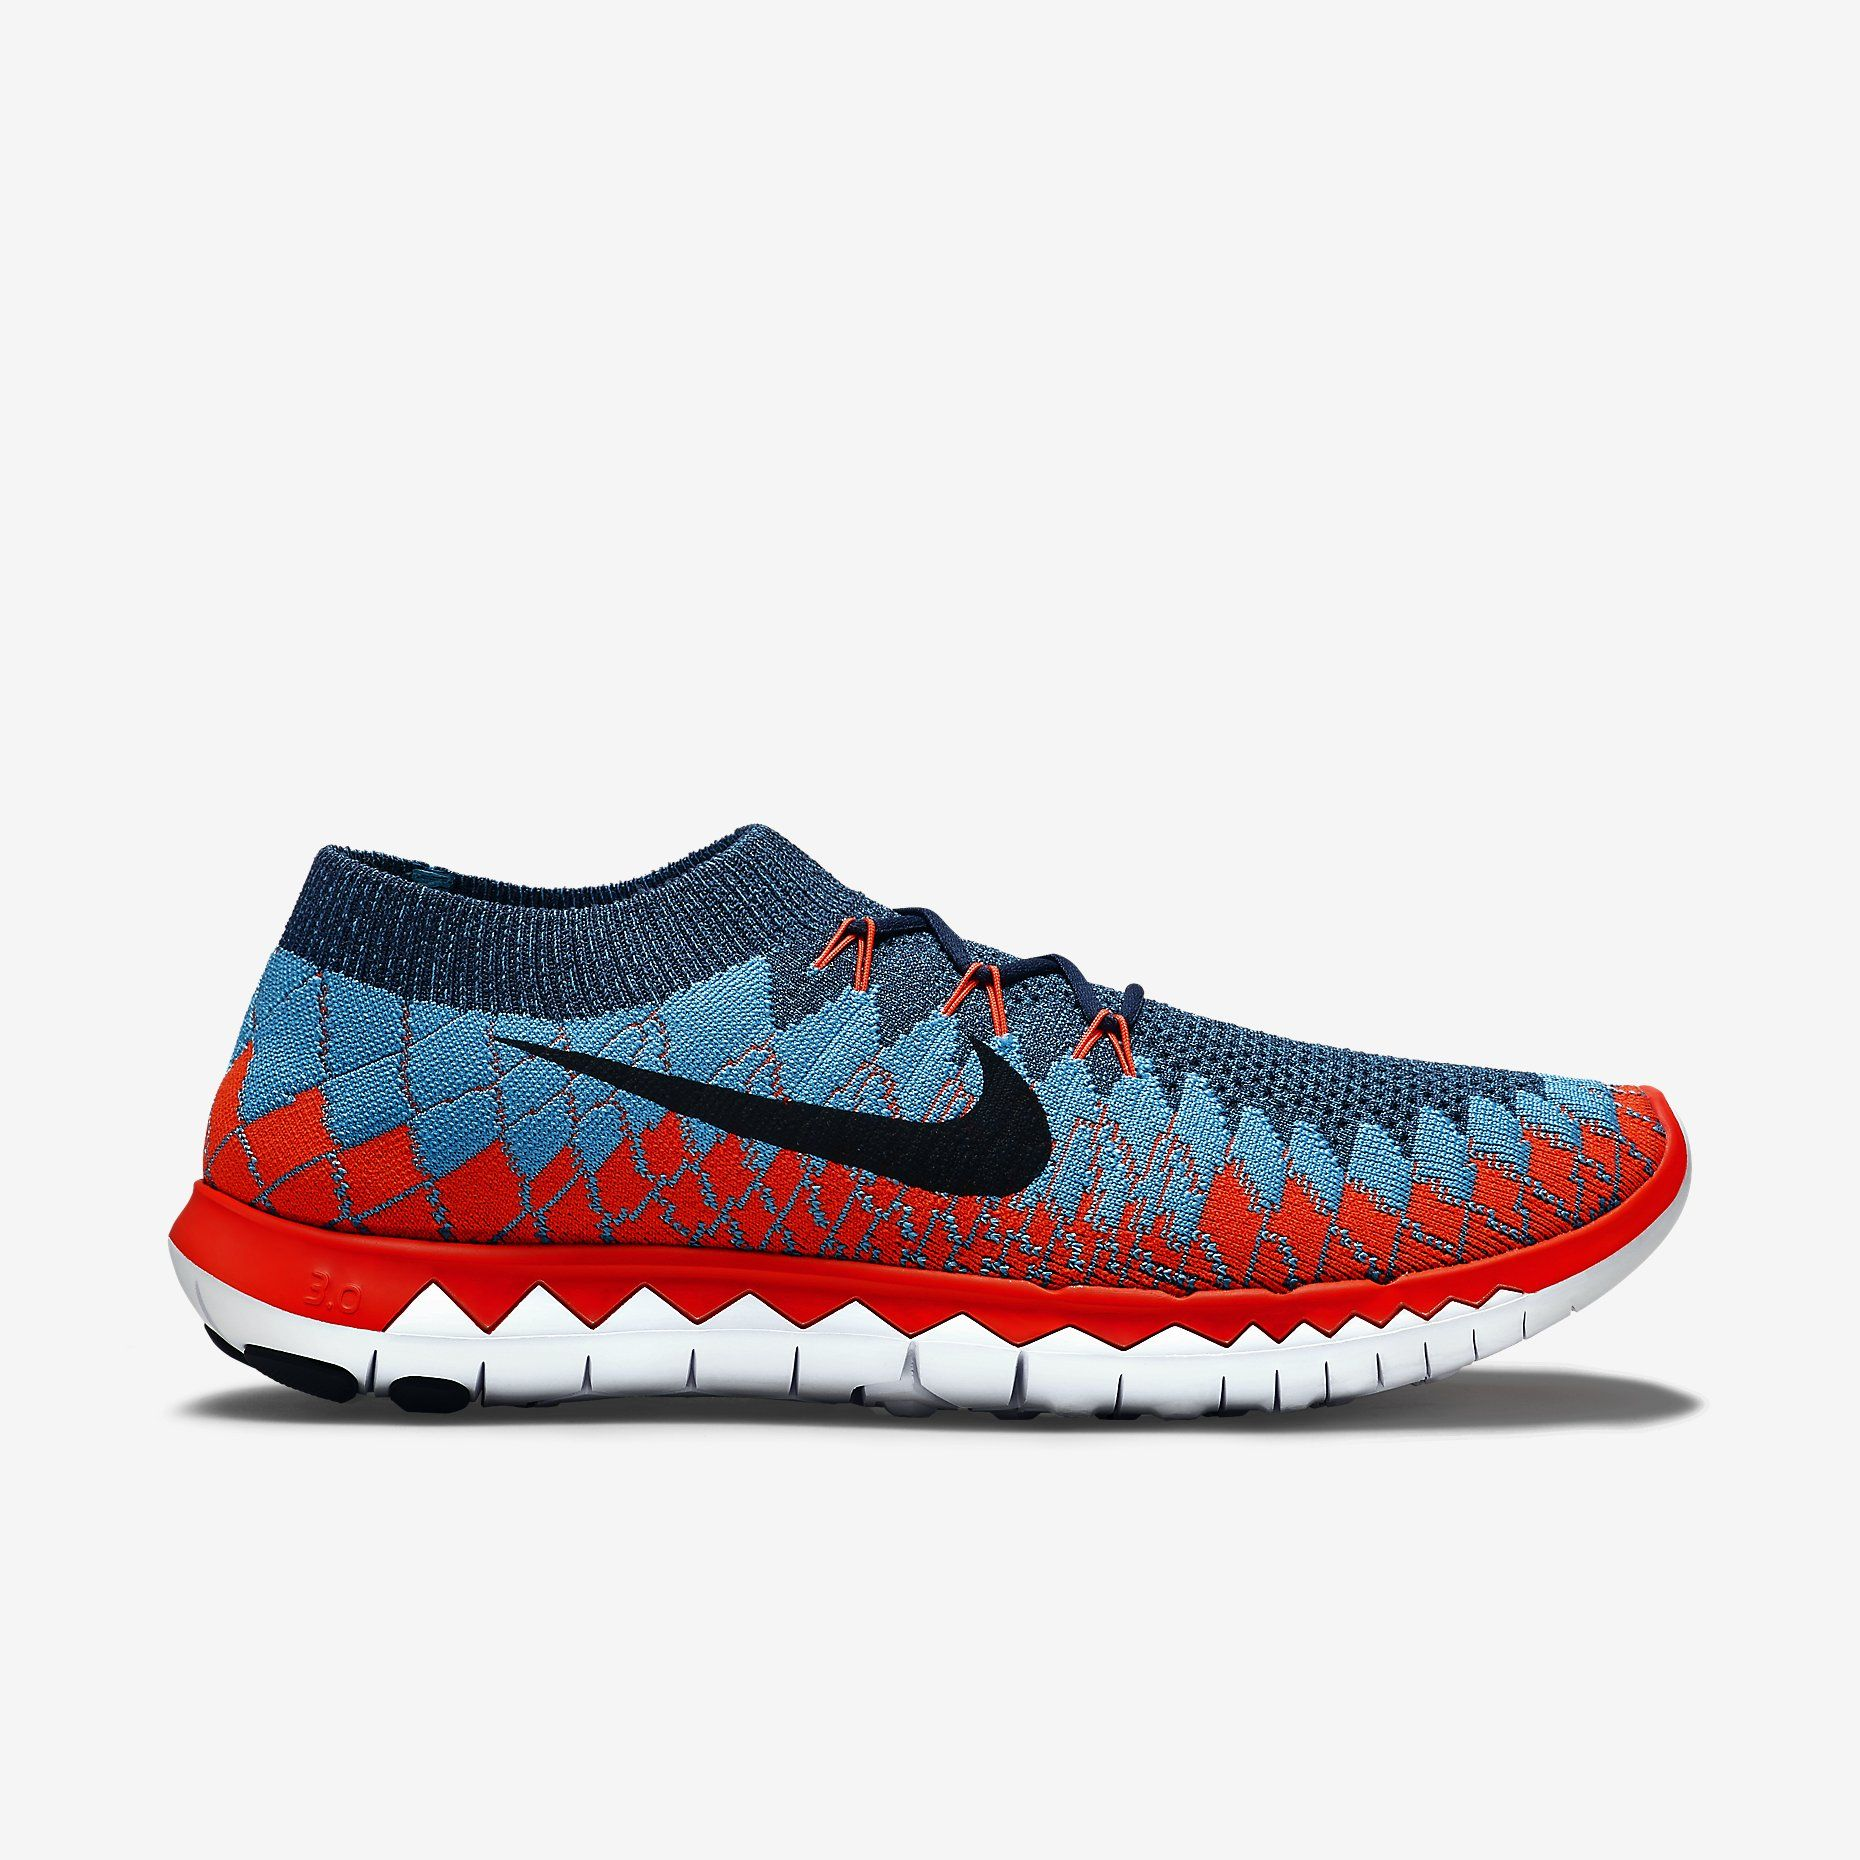 huge discount e1a48 4fd52 Nike Free 3.0 Flyknit Men s Running Shoe. Nike Store